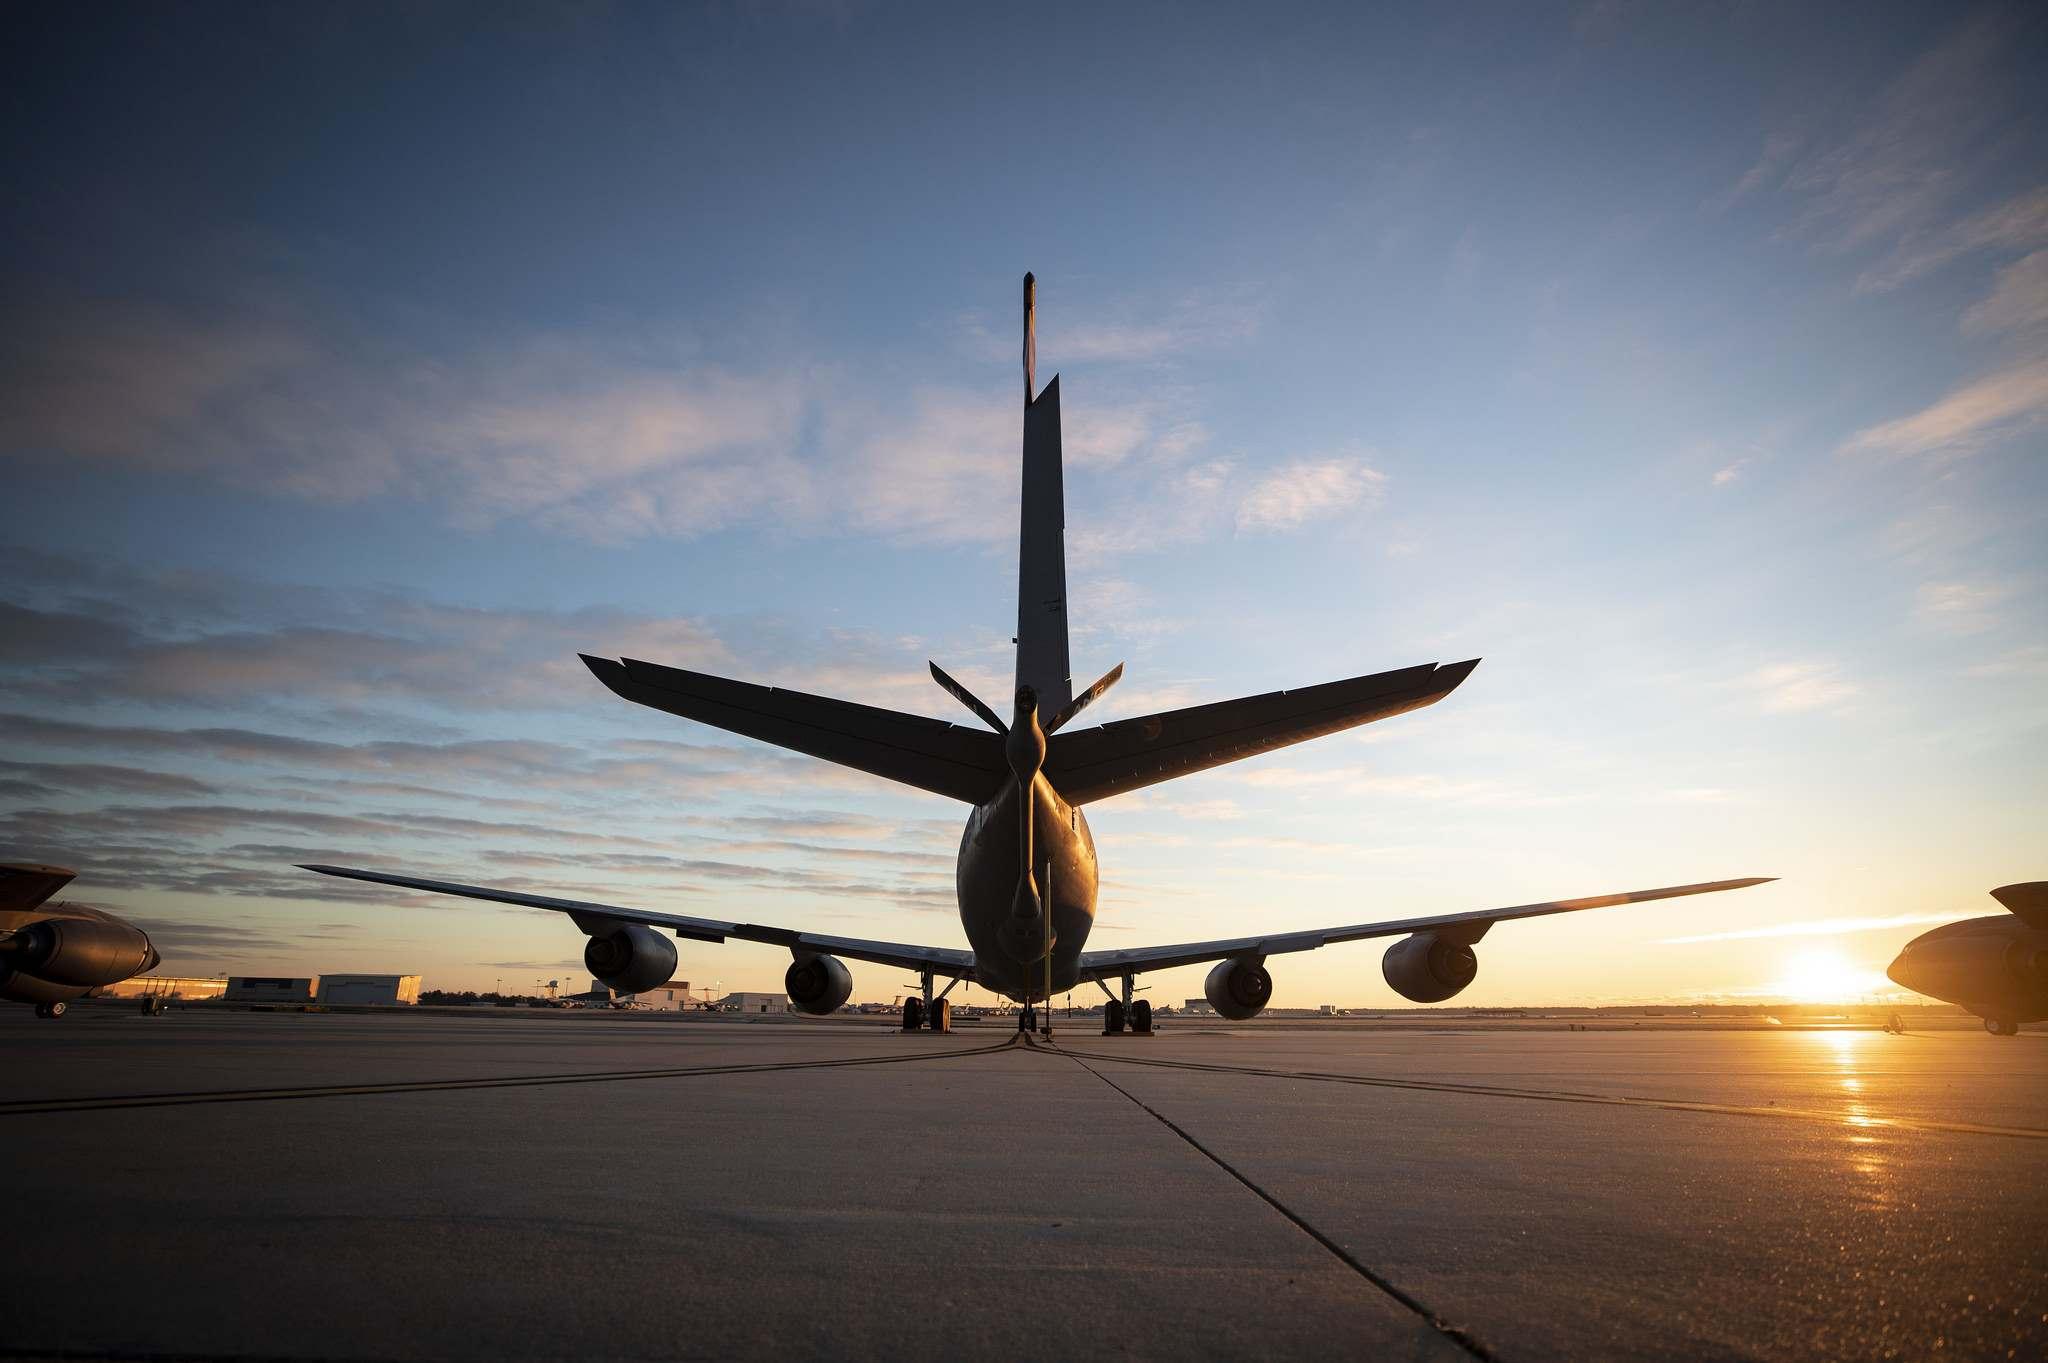 boeing kc 1351 Boeing KC 135R Stratotanker Photos